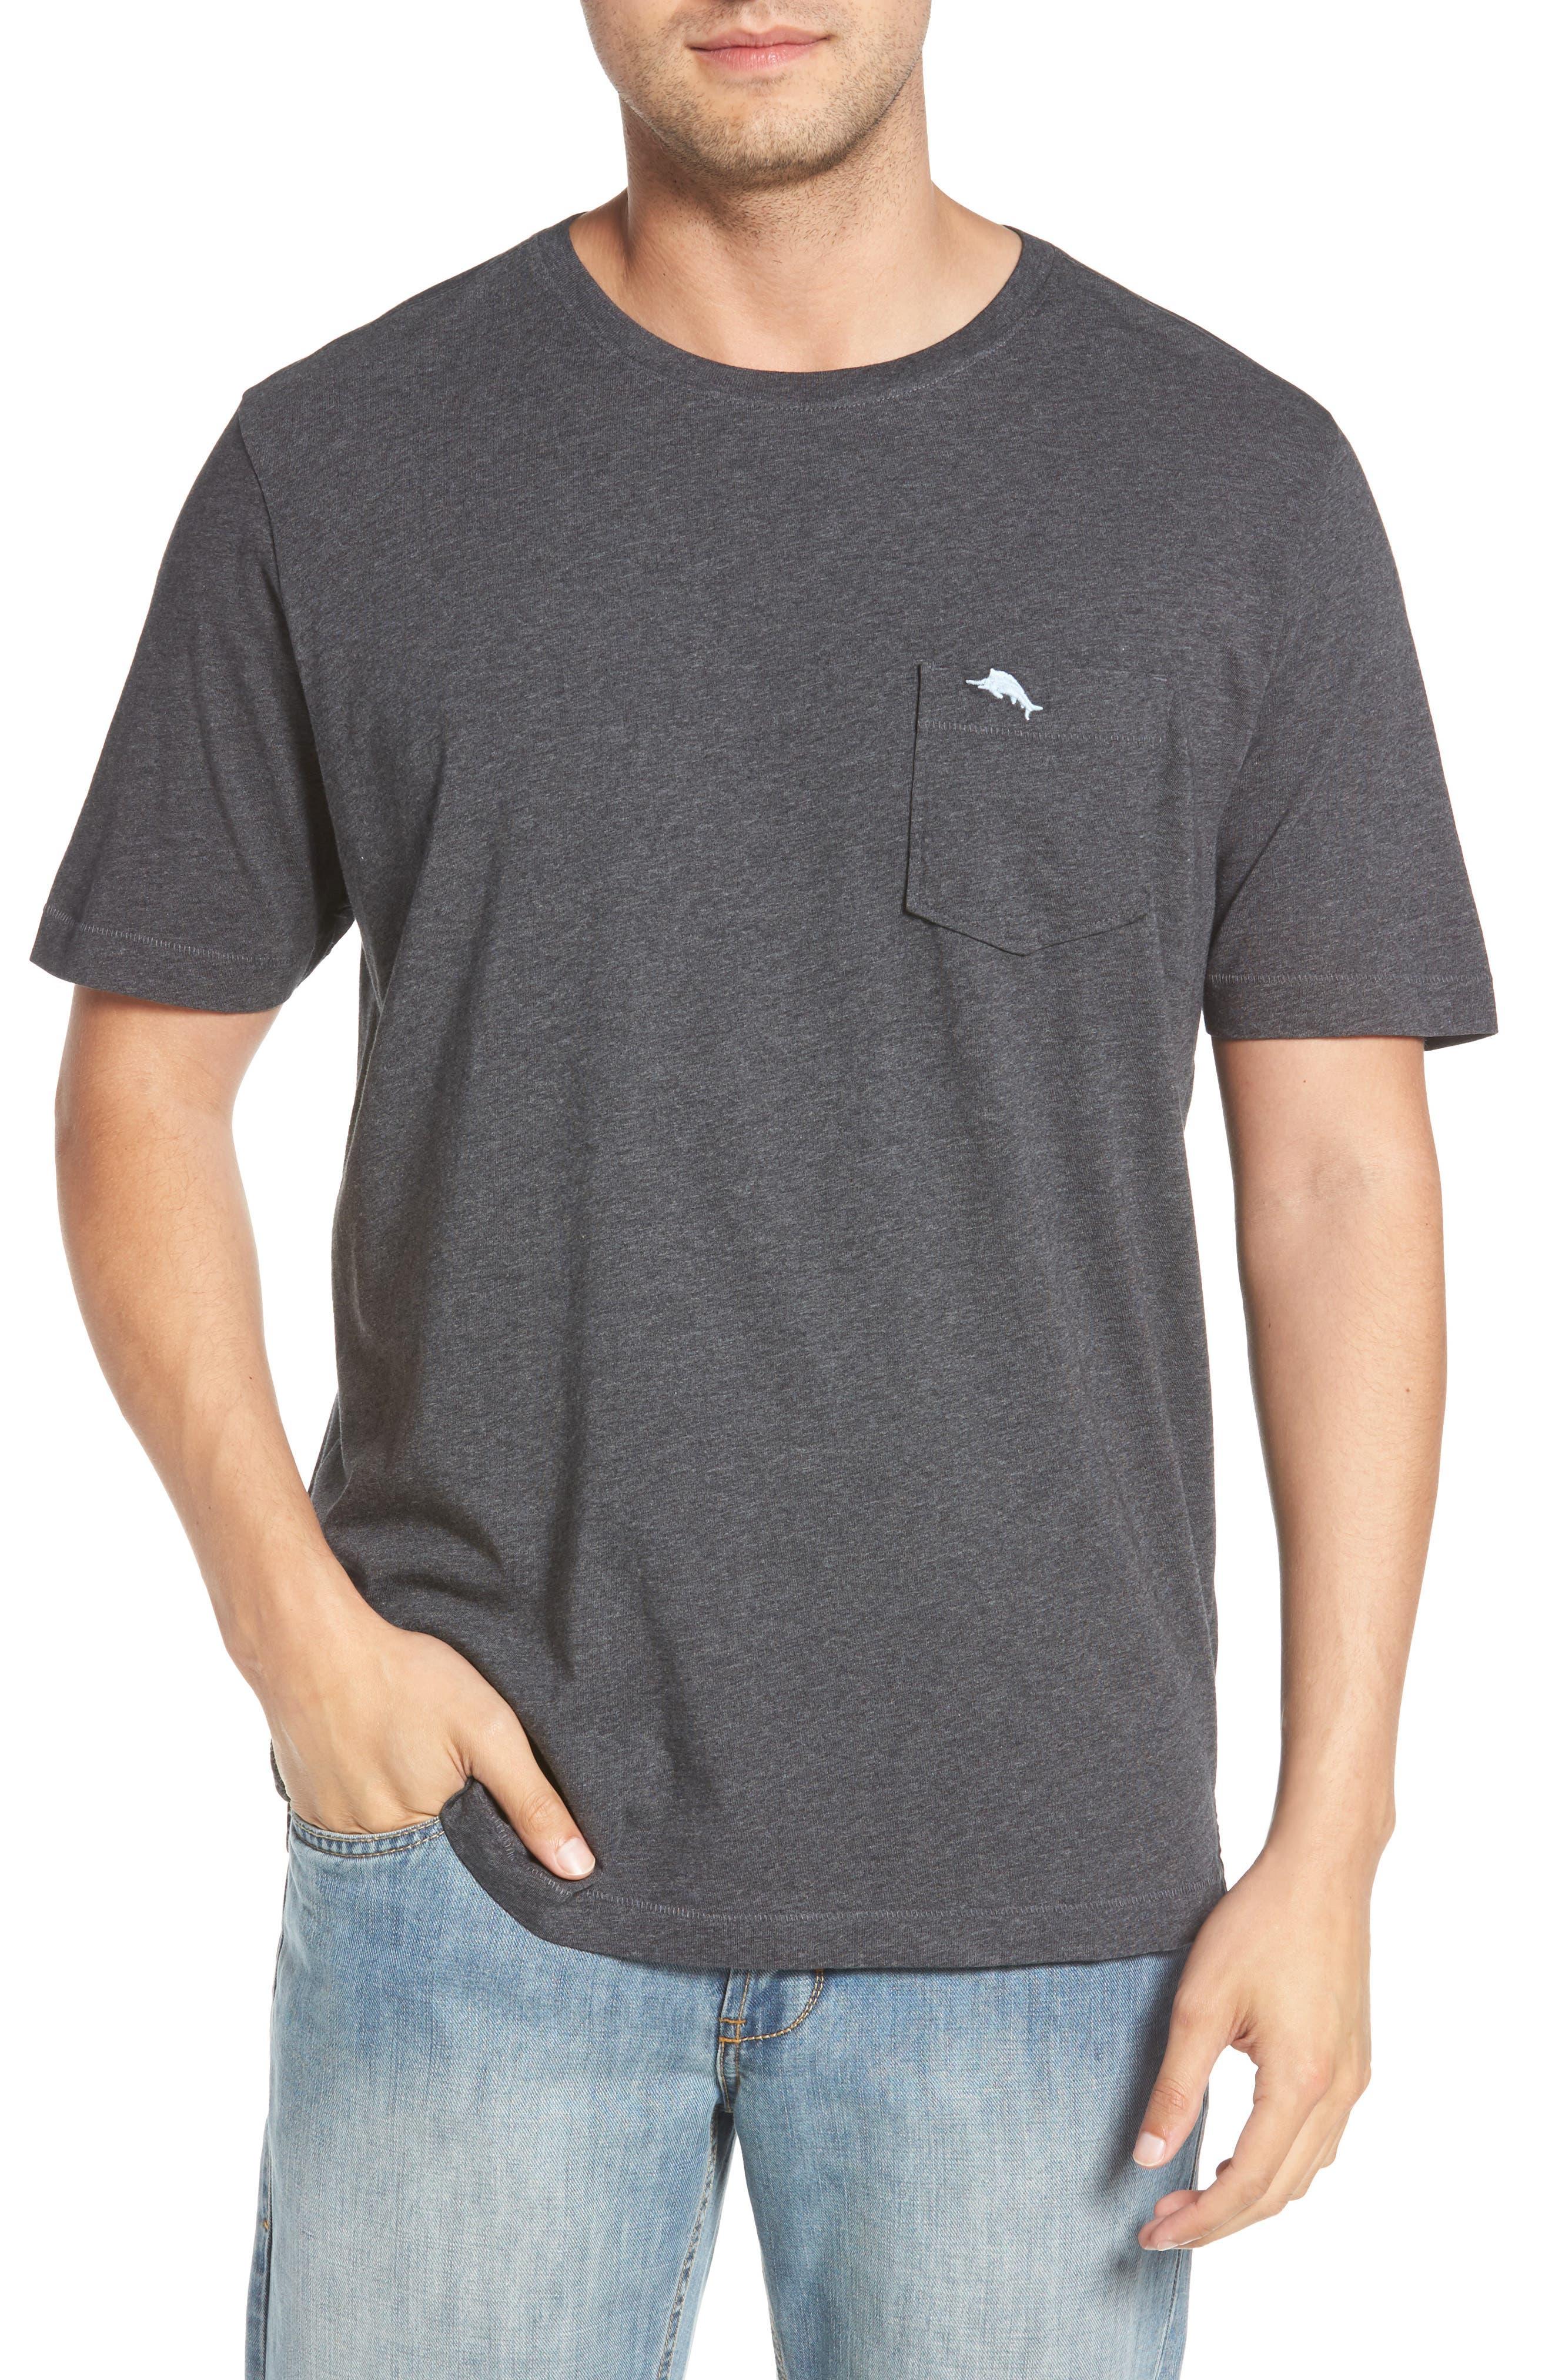 TOMMY BAHAMA 'New Bali Sky' Original Fit Crewneck Pocket T-Shirt, Main, color, CHARCOAL HEATHER